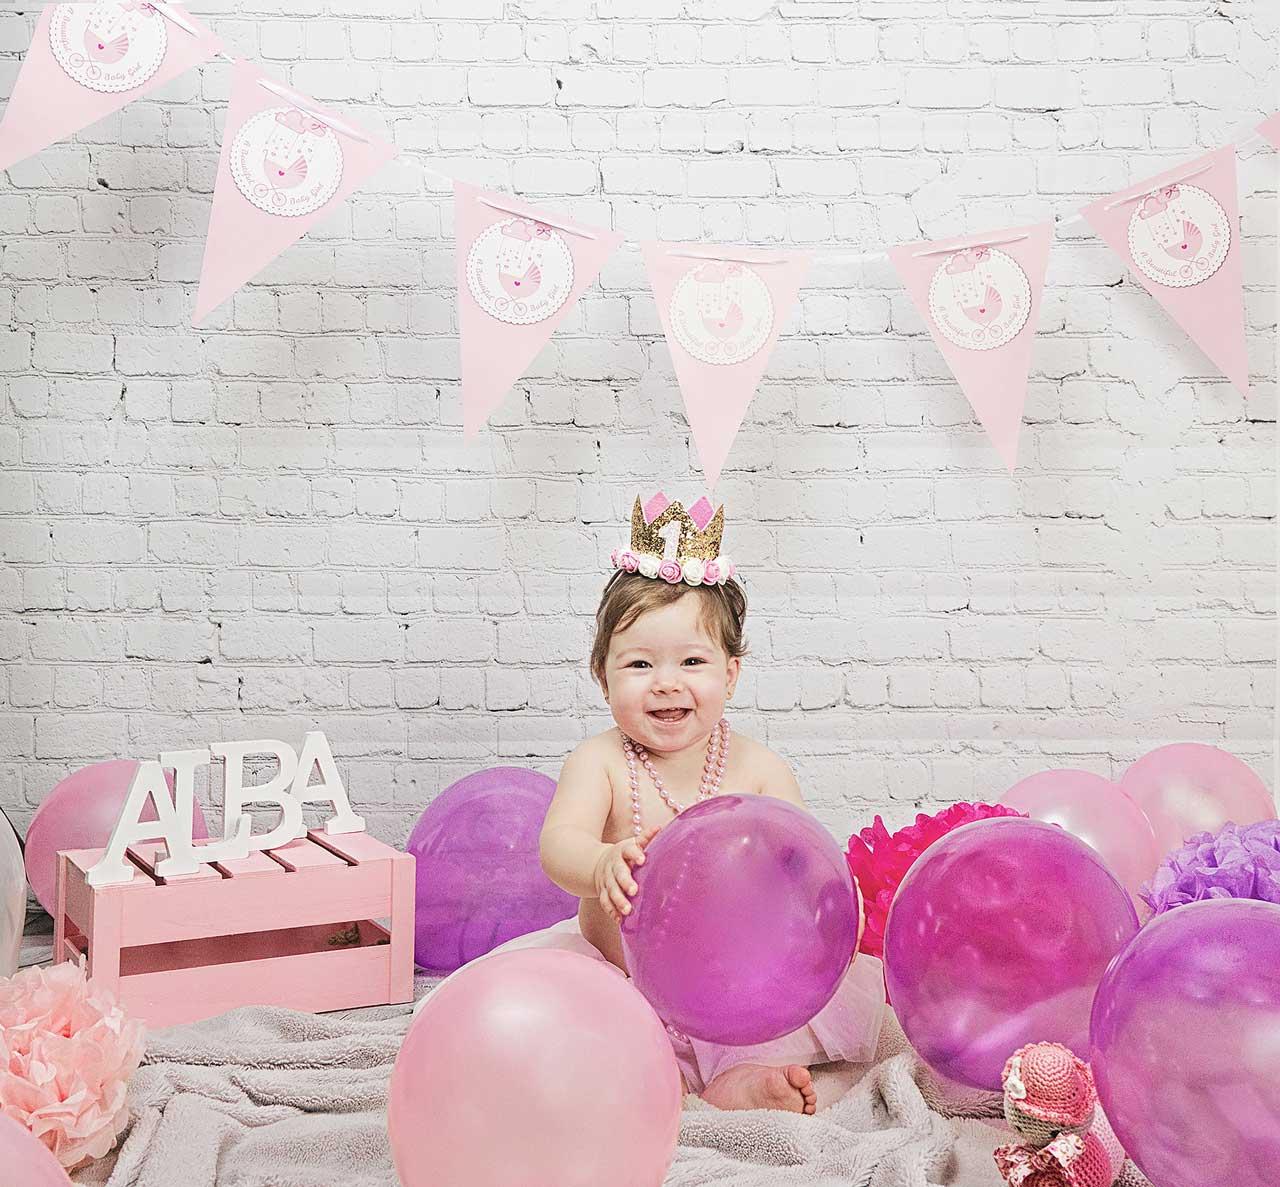 https://www.kidsphotography.es/wp-content/uploads/2021/04/Sesion-Smash-Cake-Alba-8874-©-Kids-Photography.jpg